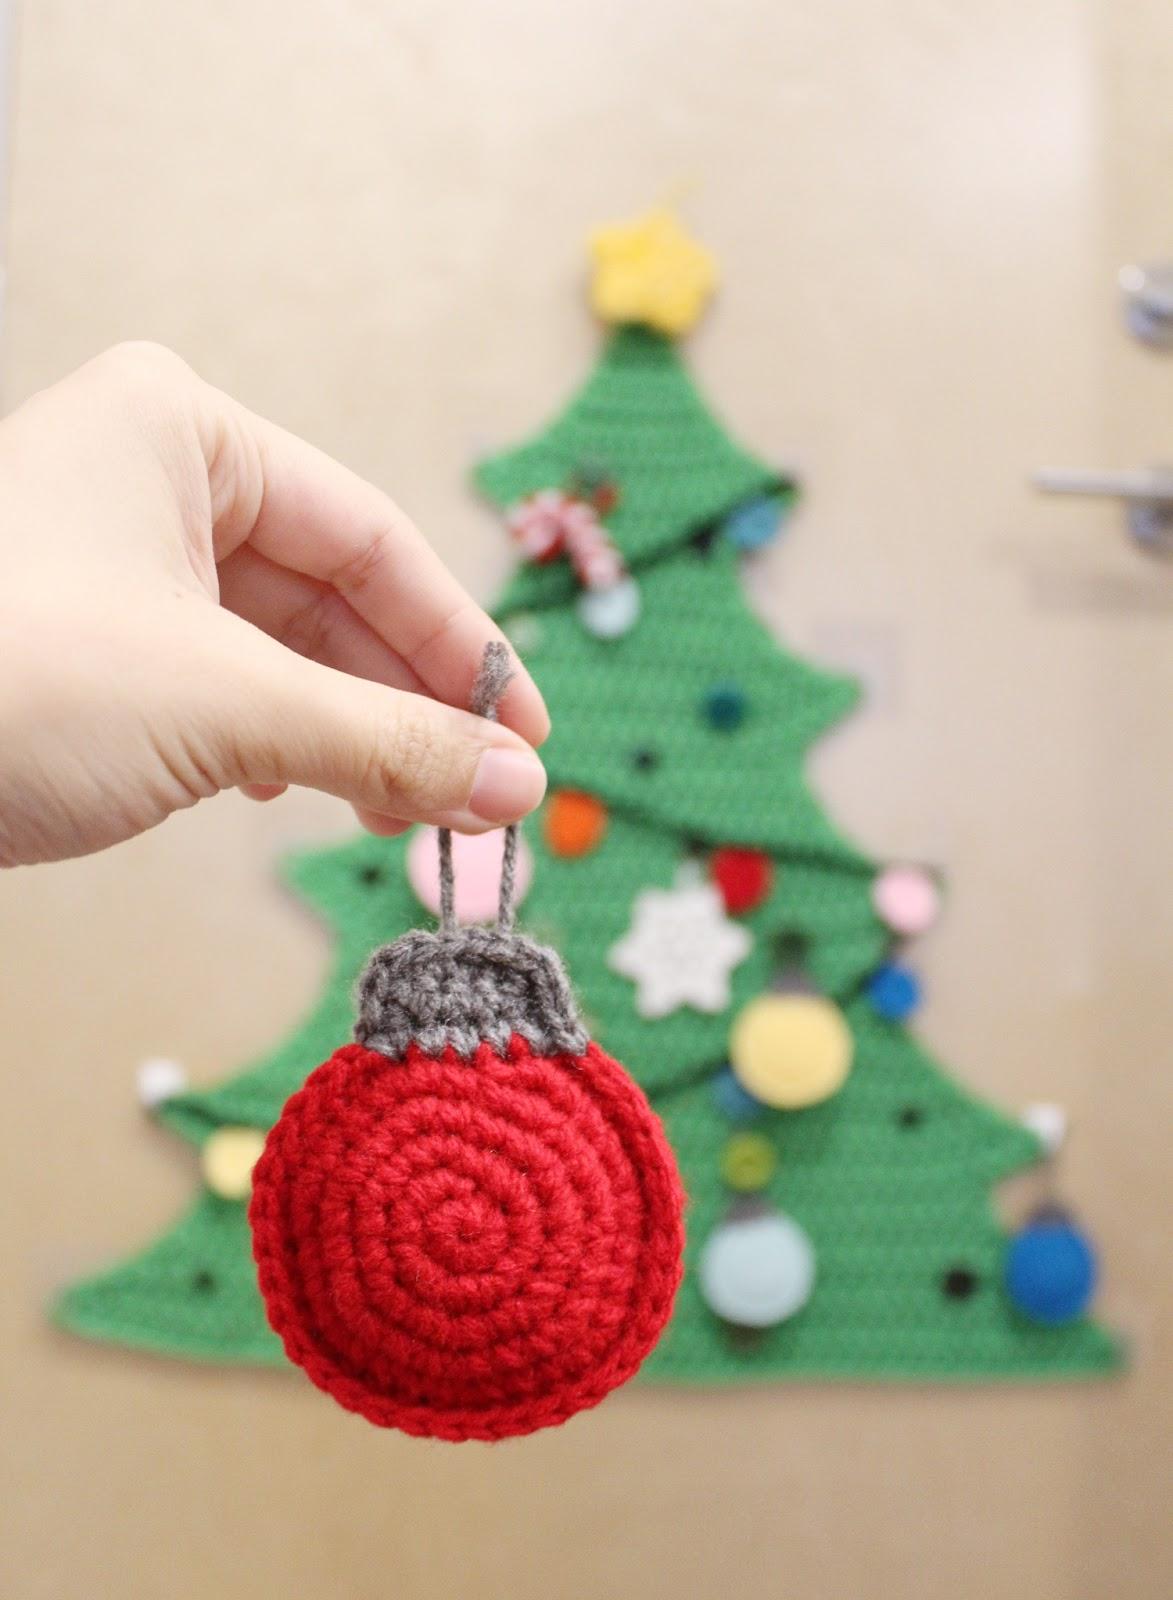 Crochet Christmas Ornaments.Flatland Christmas Bauble Ornaments Crochet Pattern Once